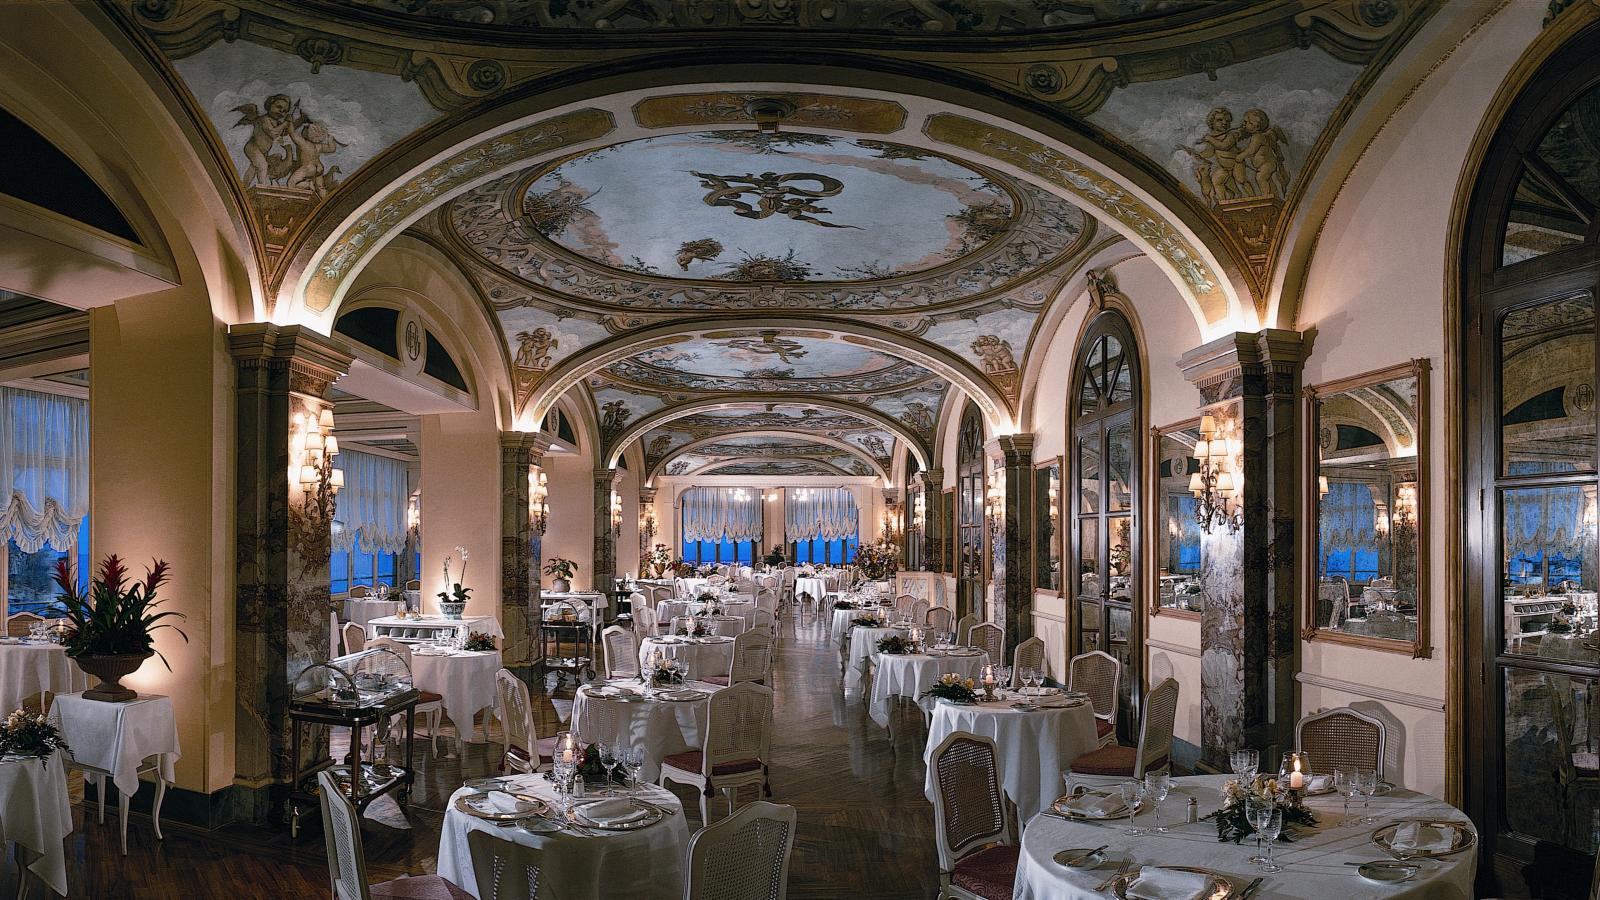 Grand hotel excelsior vittoria sorrento bay of naples for Terrazza vittoria sorrento